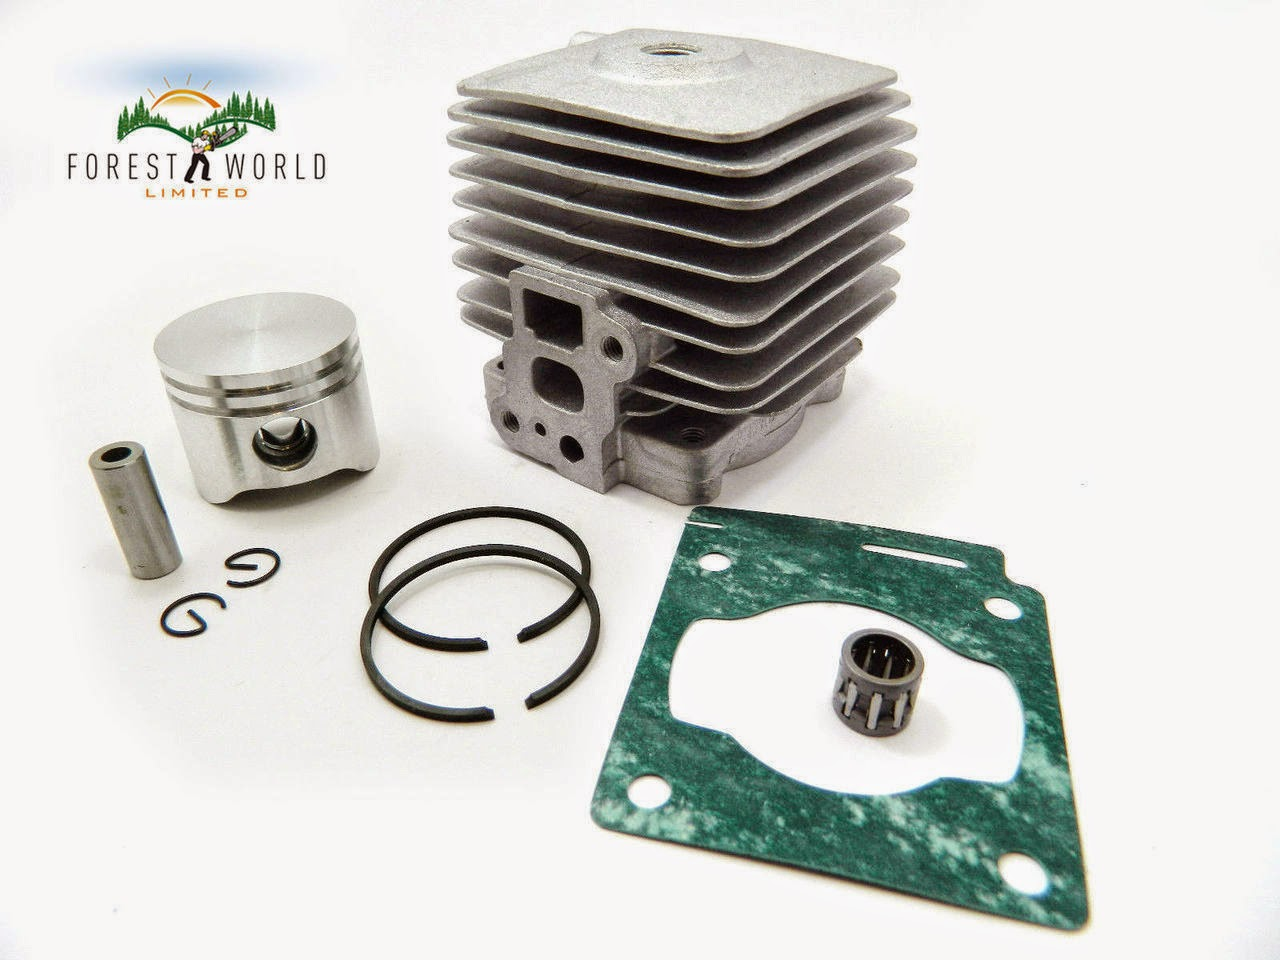 http://www.chainsawpartsonline.co.uk/stihl-hedge-trimmer-hedgecutter-cylinder-piston/